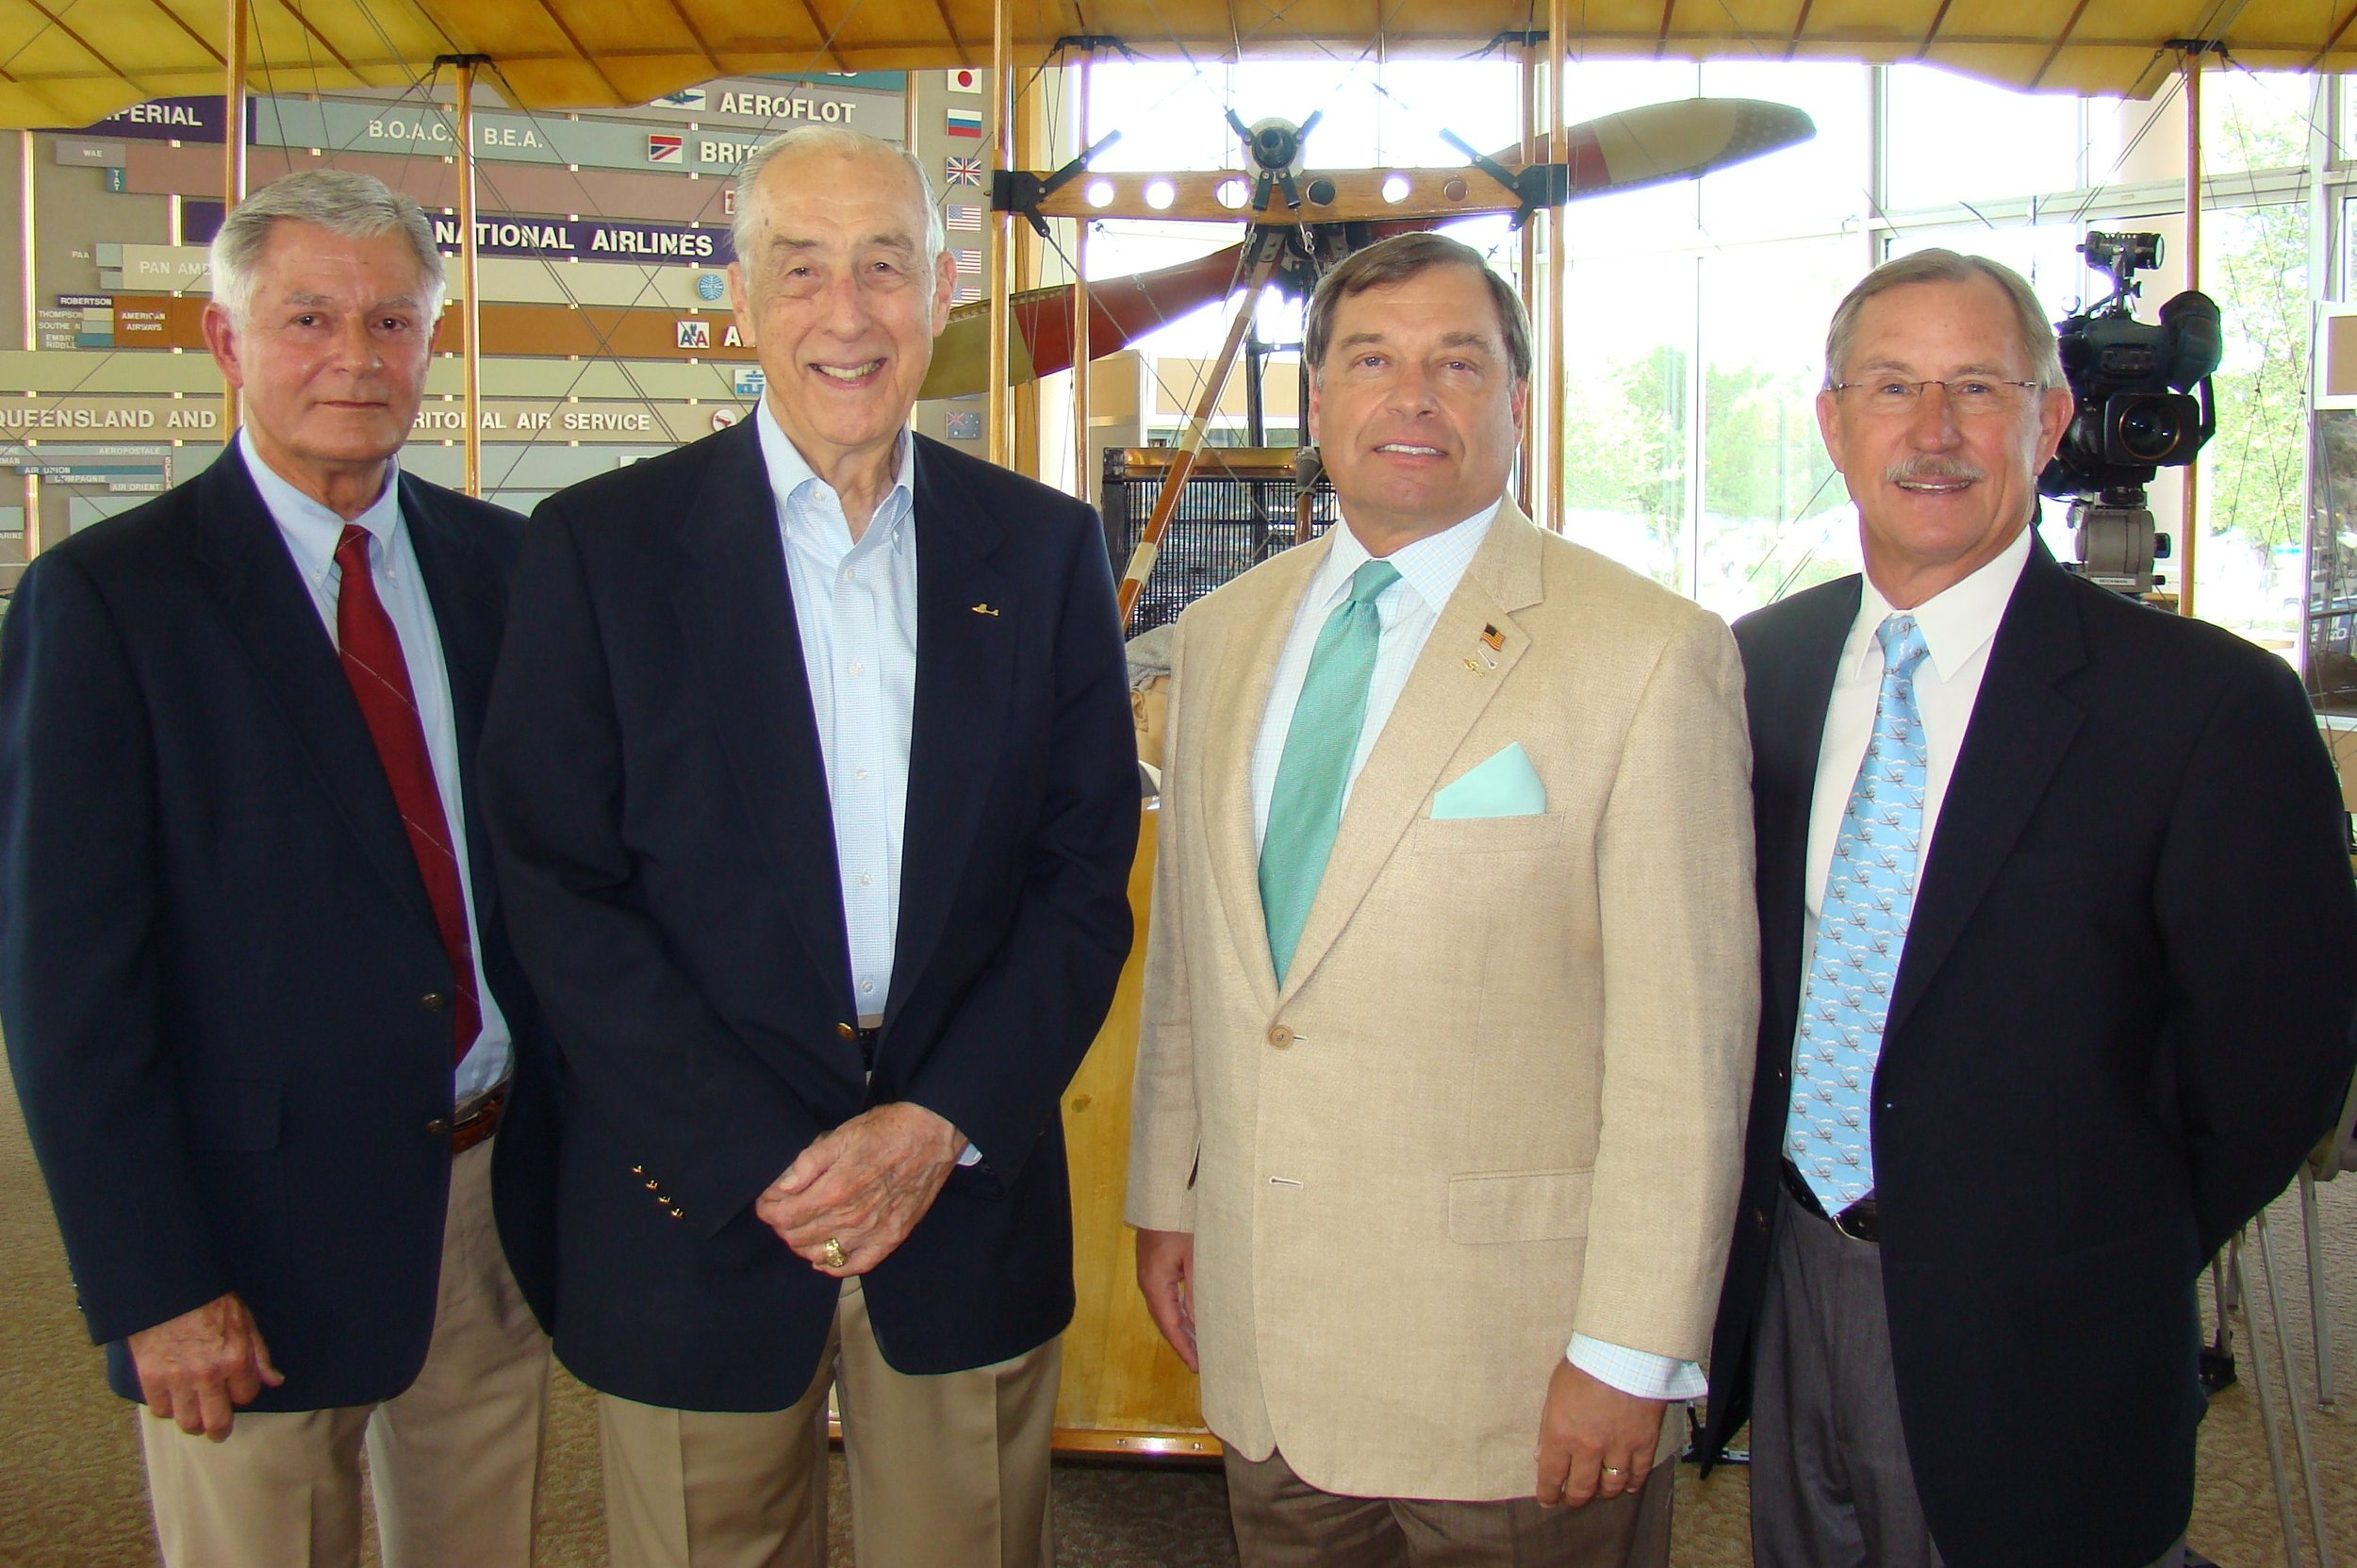 Bob Knight, Dick Newton, Tanker Snyder & John 'Lites' Leenhouts - 2, 14 Jun '12.JPG